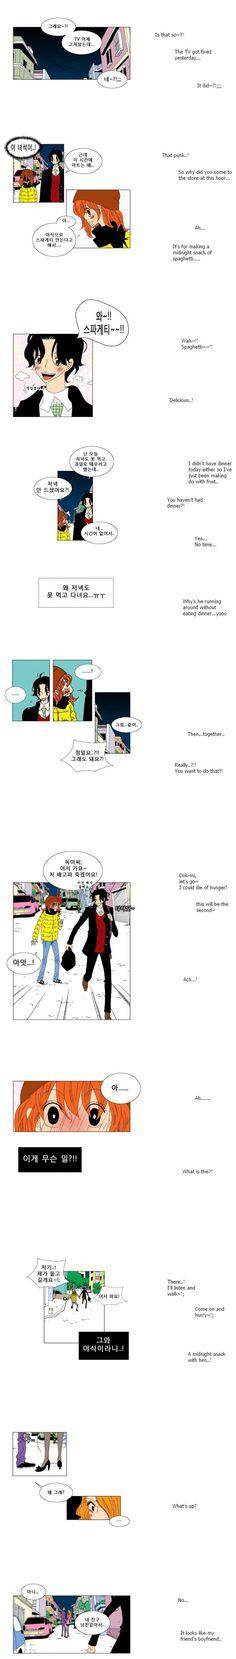 [Webtoon] I Sneak A Peak At Him Every Day 16 @ HanCinema :: The Korean Movie and Drama Database